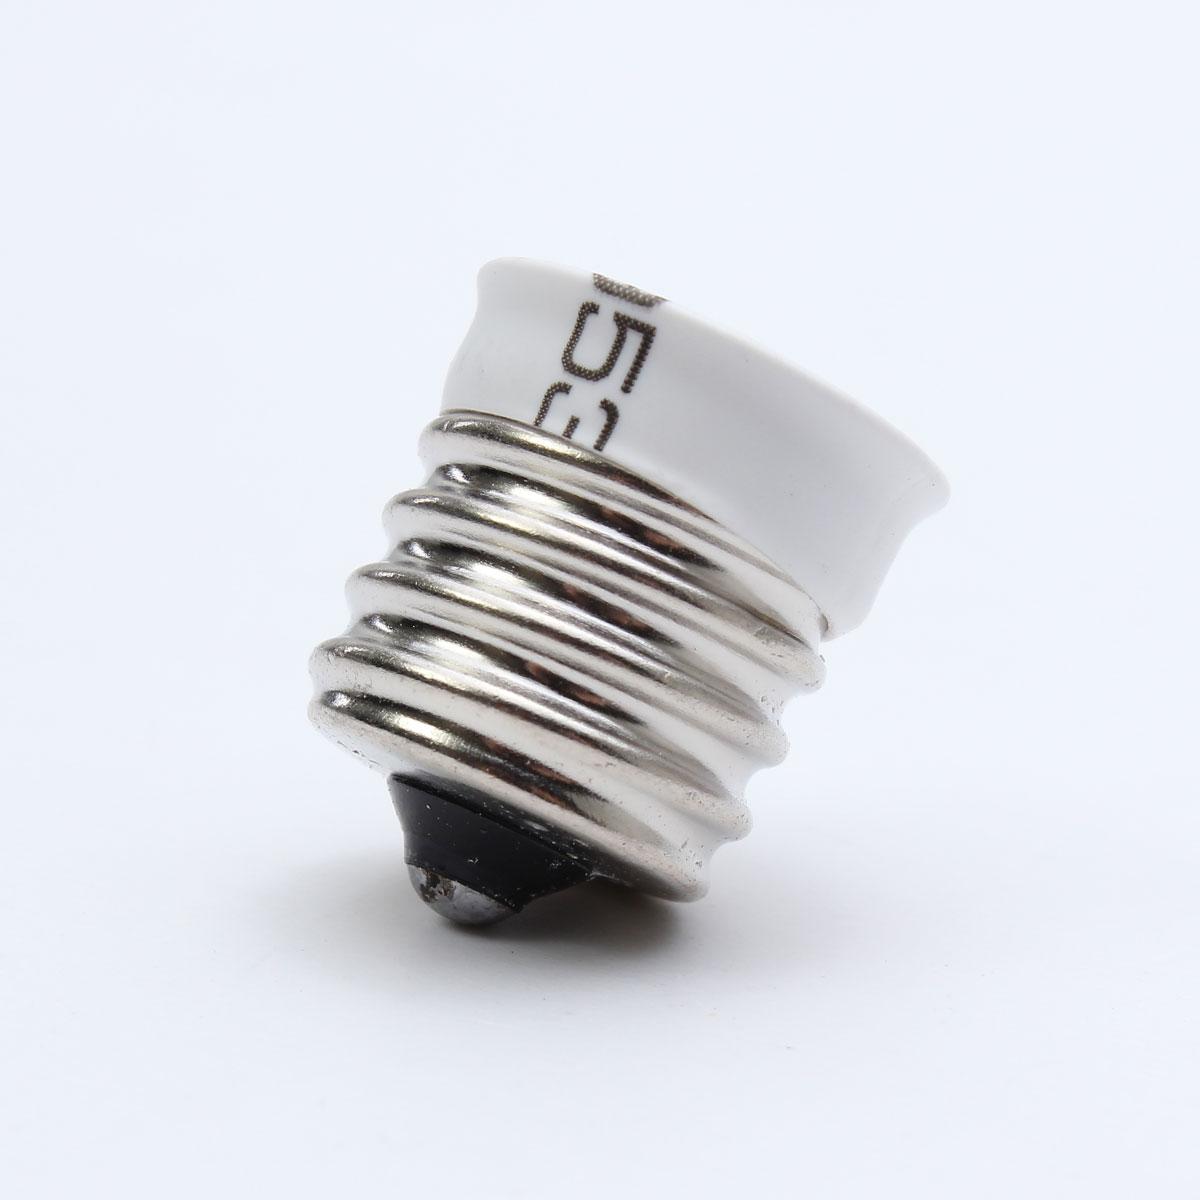 intermediate base e17 to candelabra base e12 light bulb. Black Bedroom Furniture Sets. Home Design Ideas